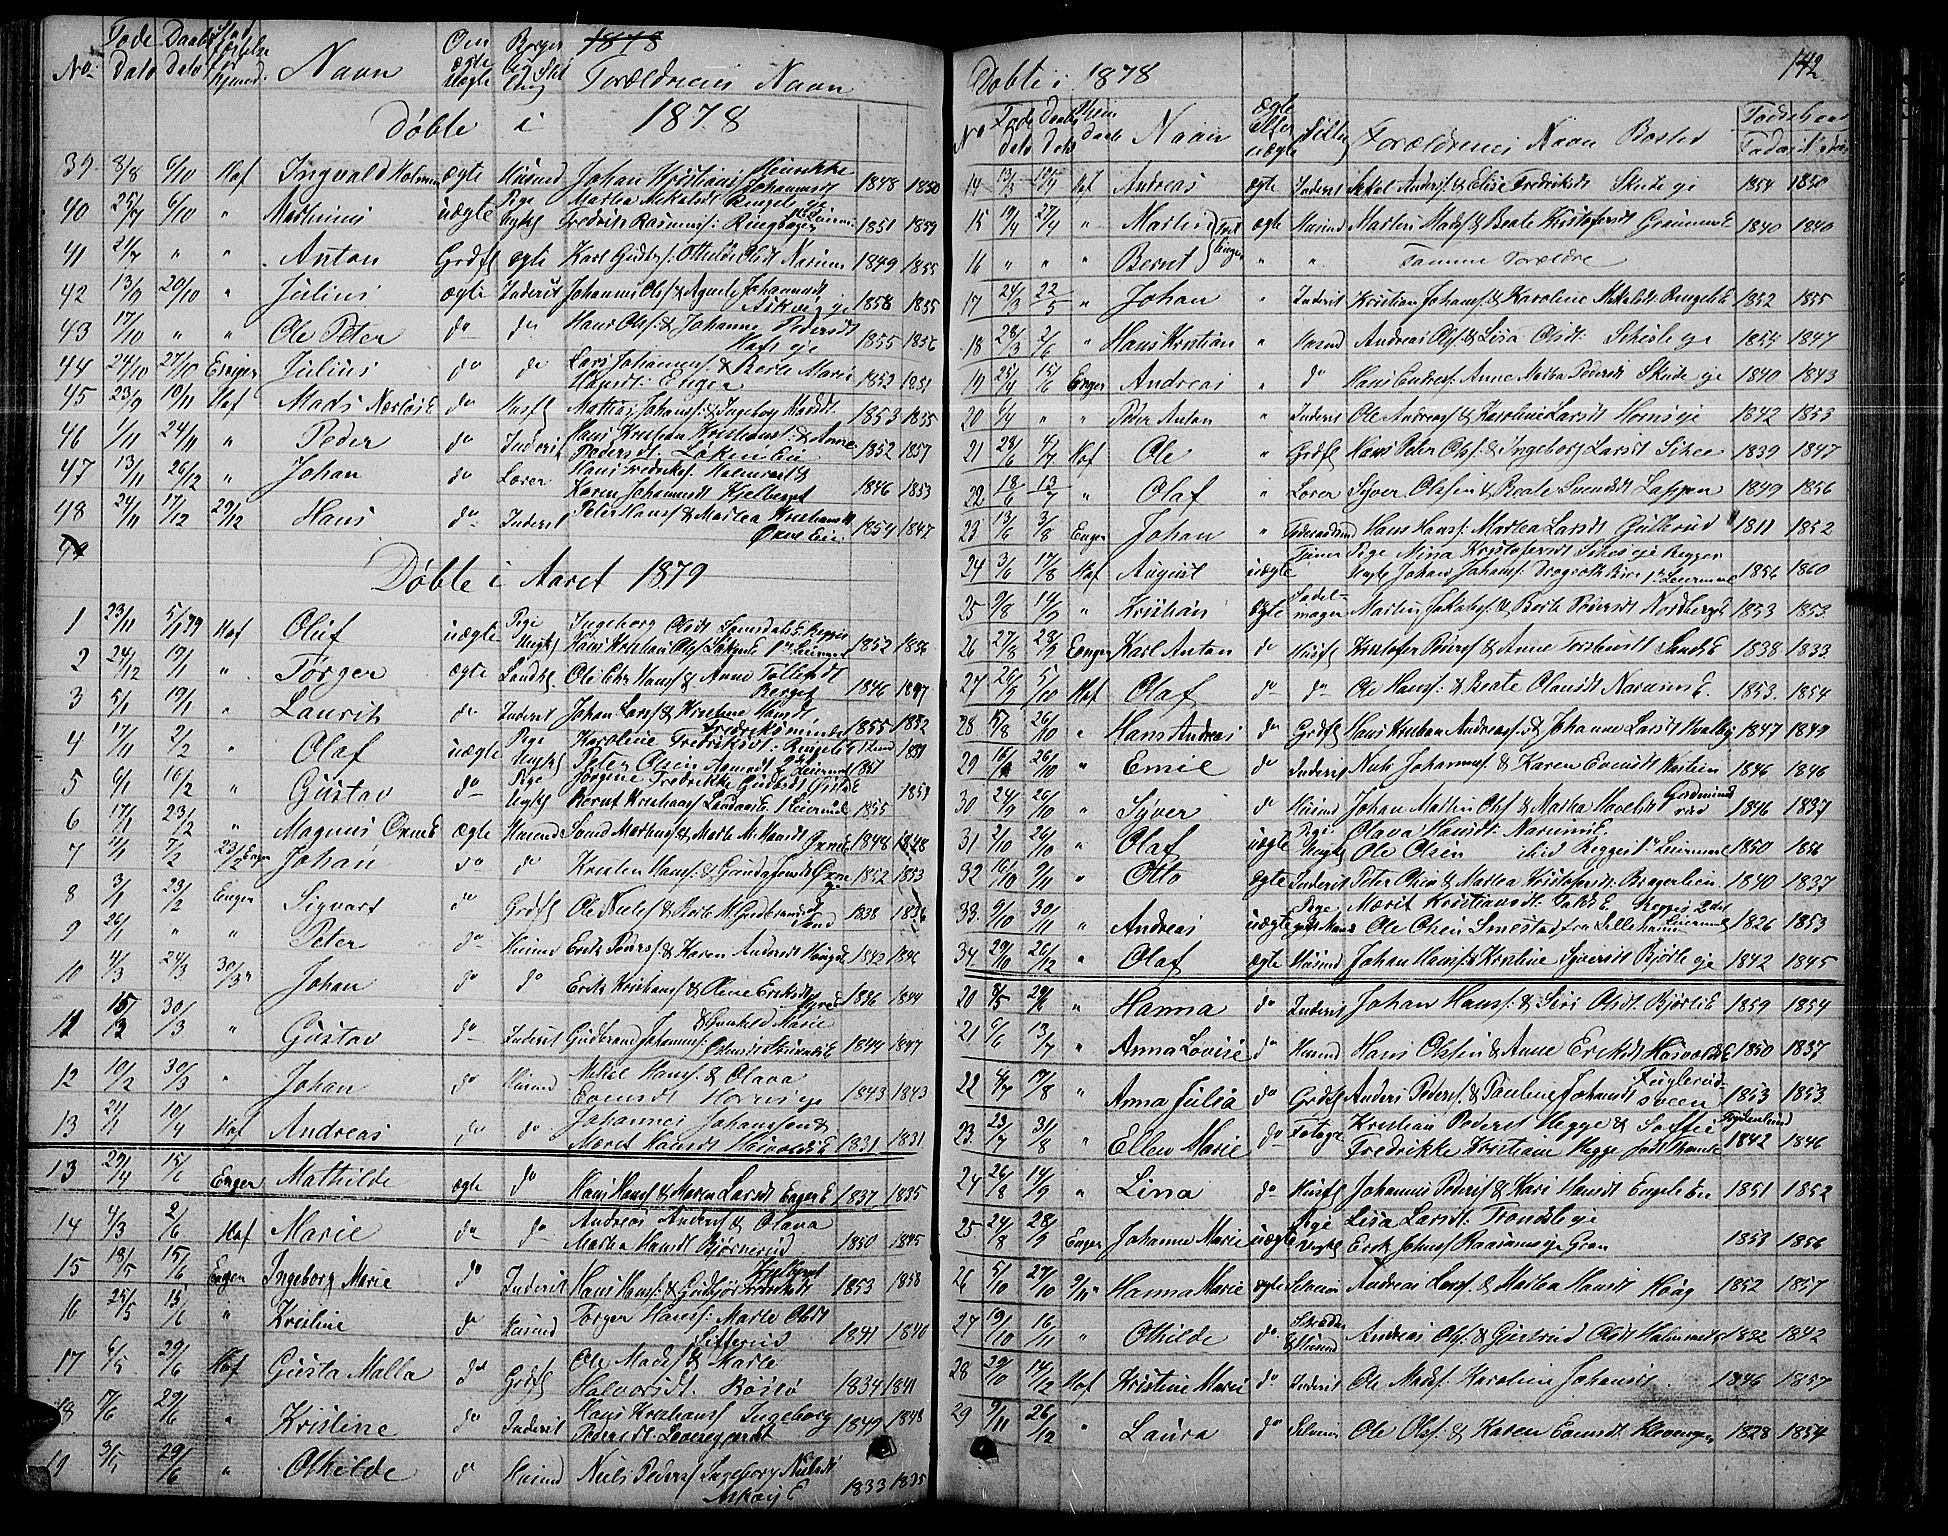 SAH, Søndre Land prestekontor, L/L0001: Klokkerbok nr. 1, 1849-1883, s. 142